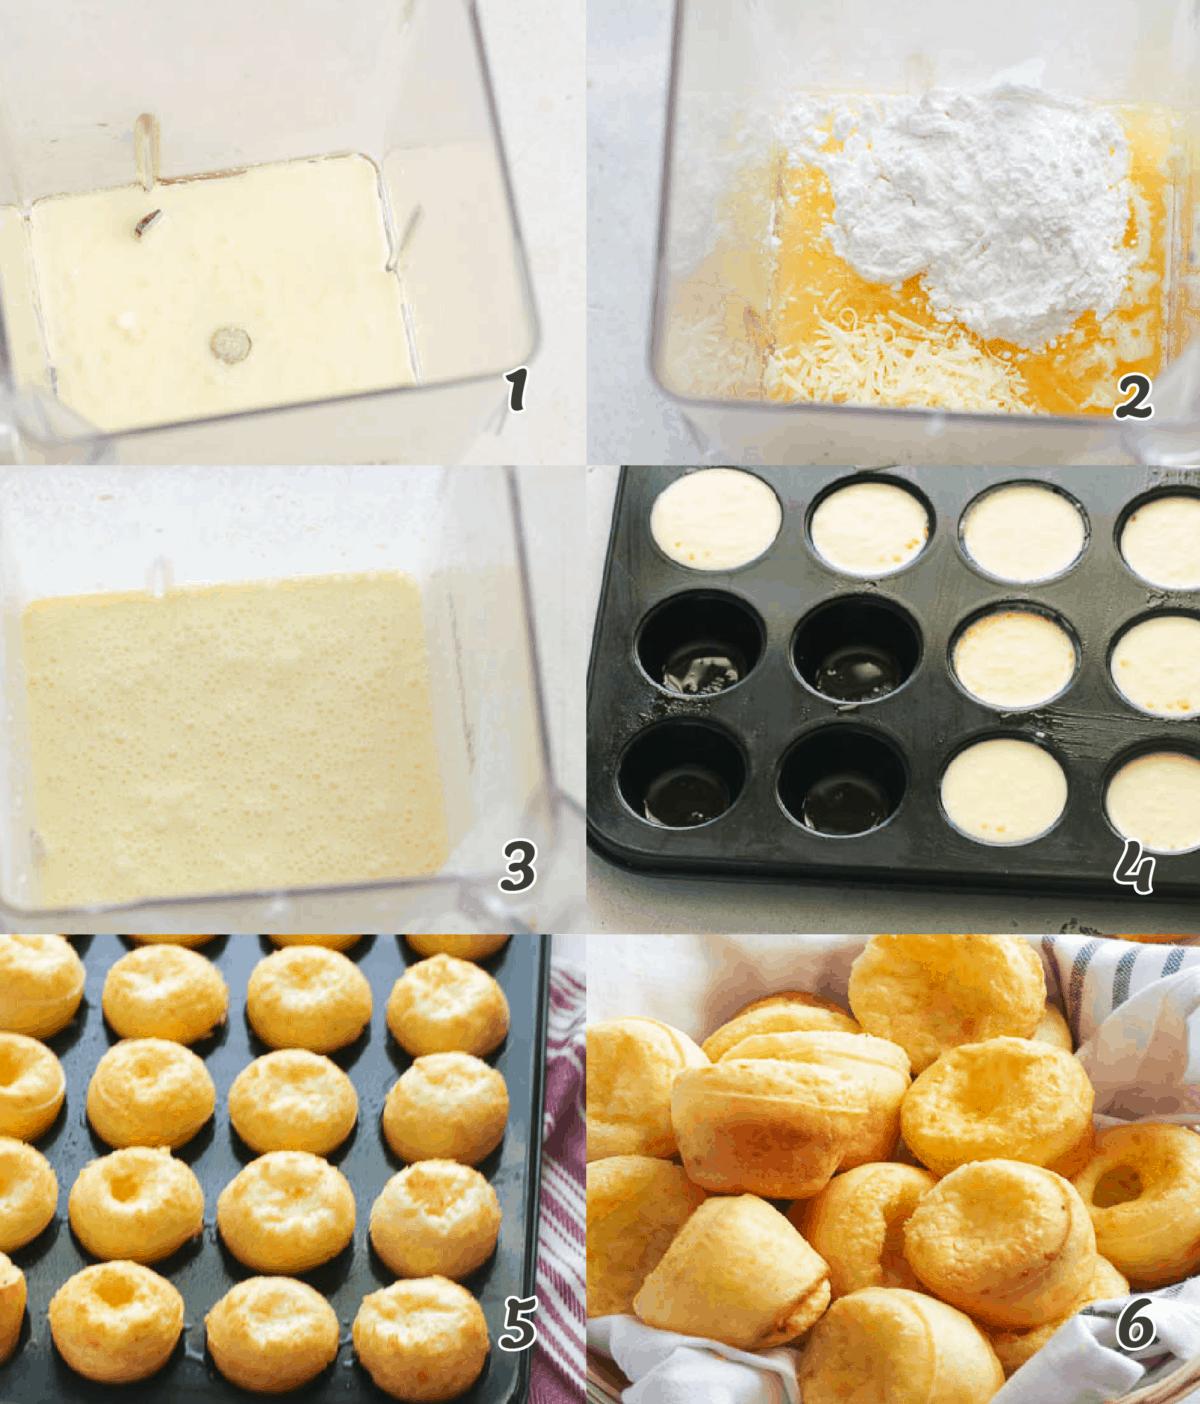 How to Make Pao de Queijo